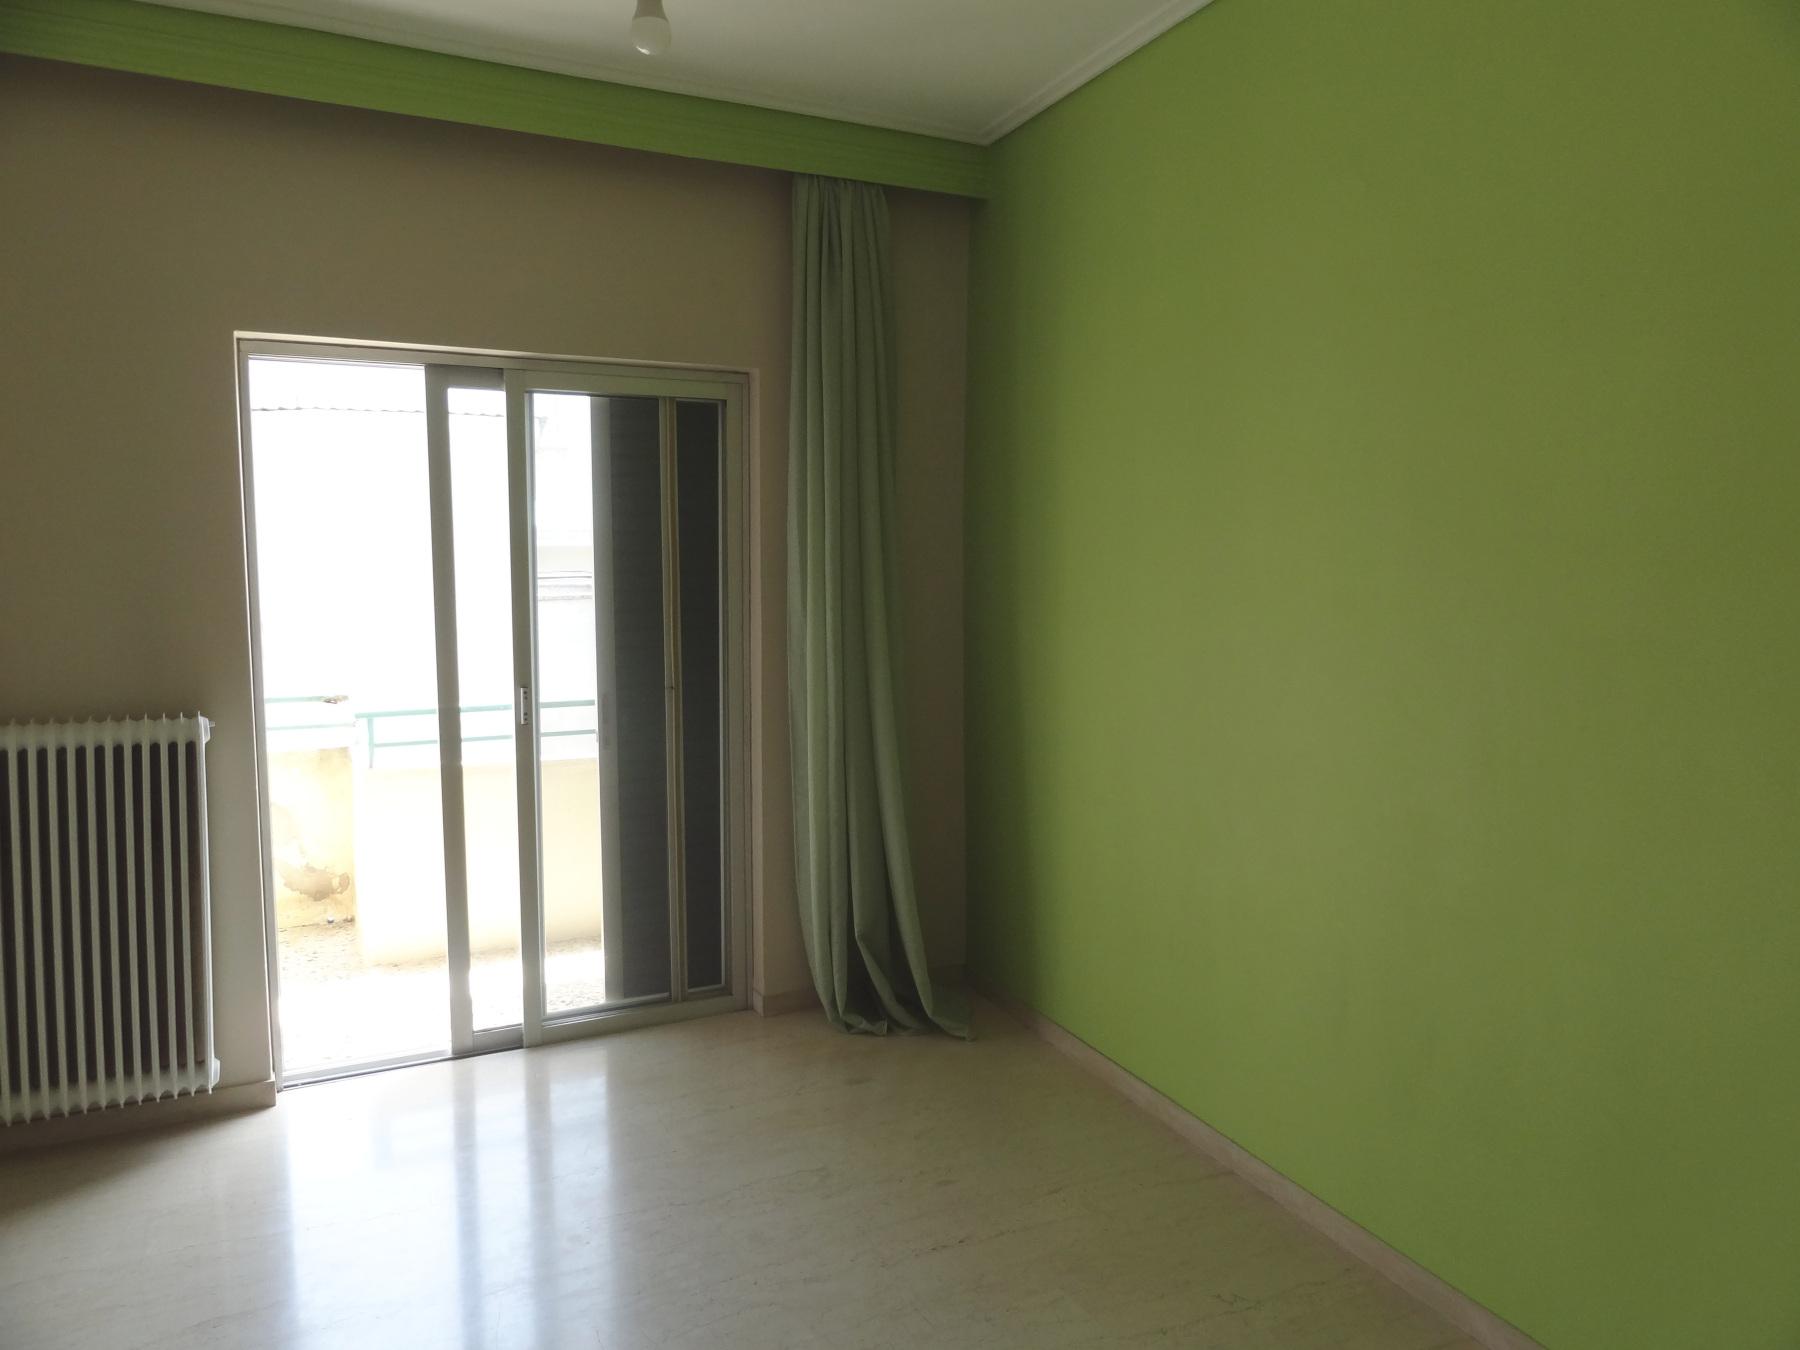 For rent comfortable 1 bedroom apartment of 55 sq.m. 1st floor near Pargis square in Ioannina.